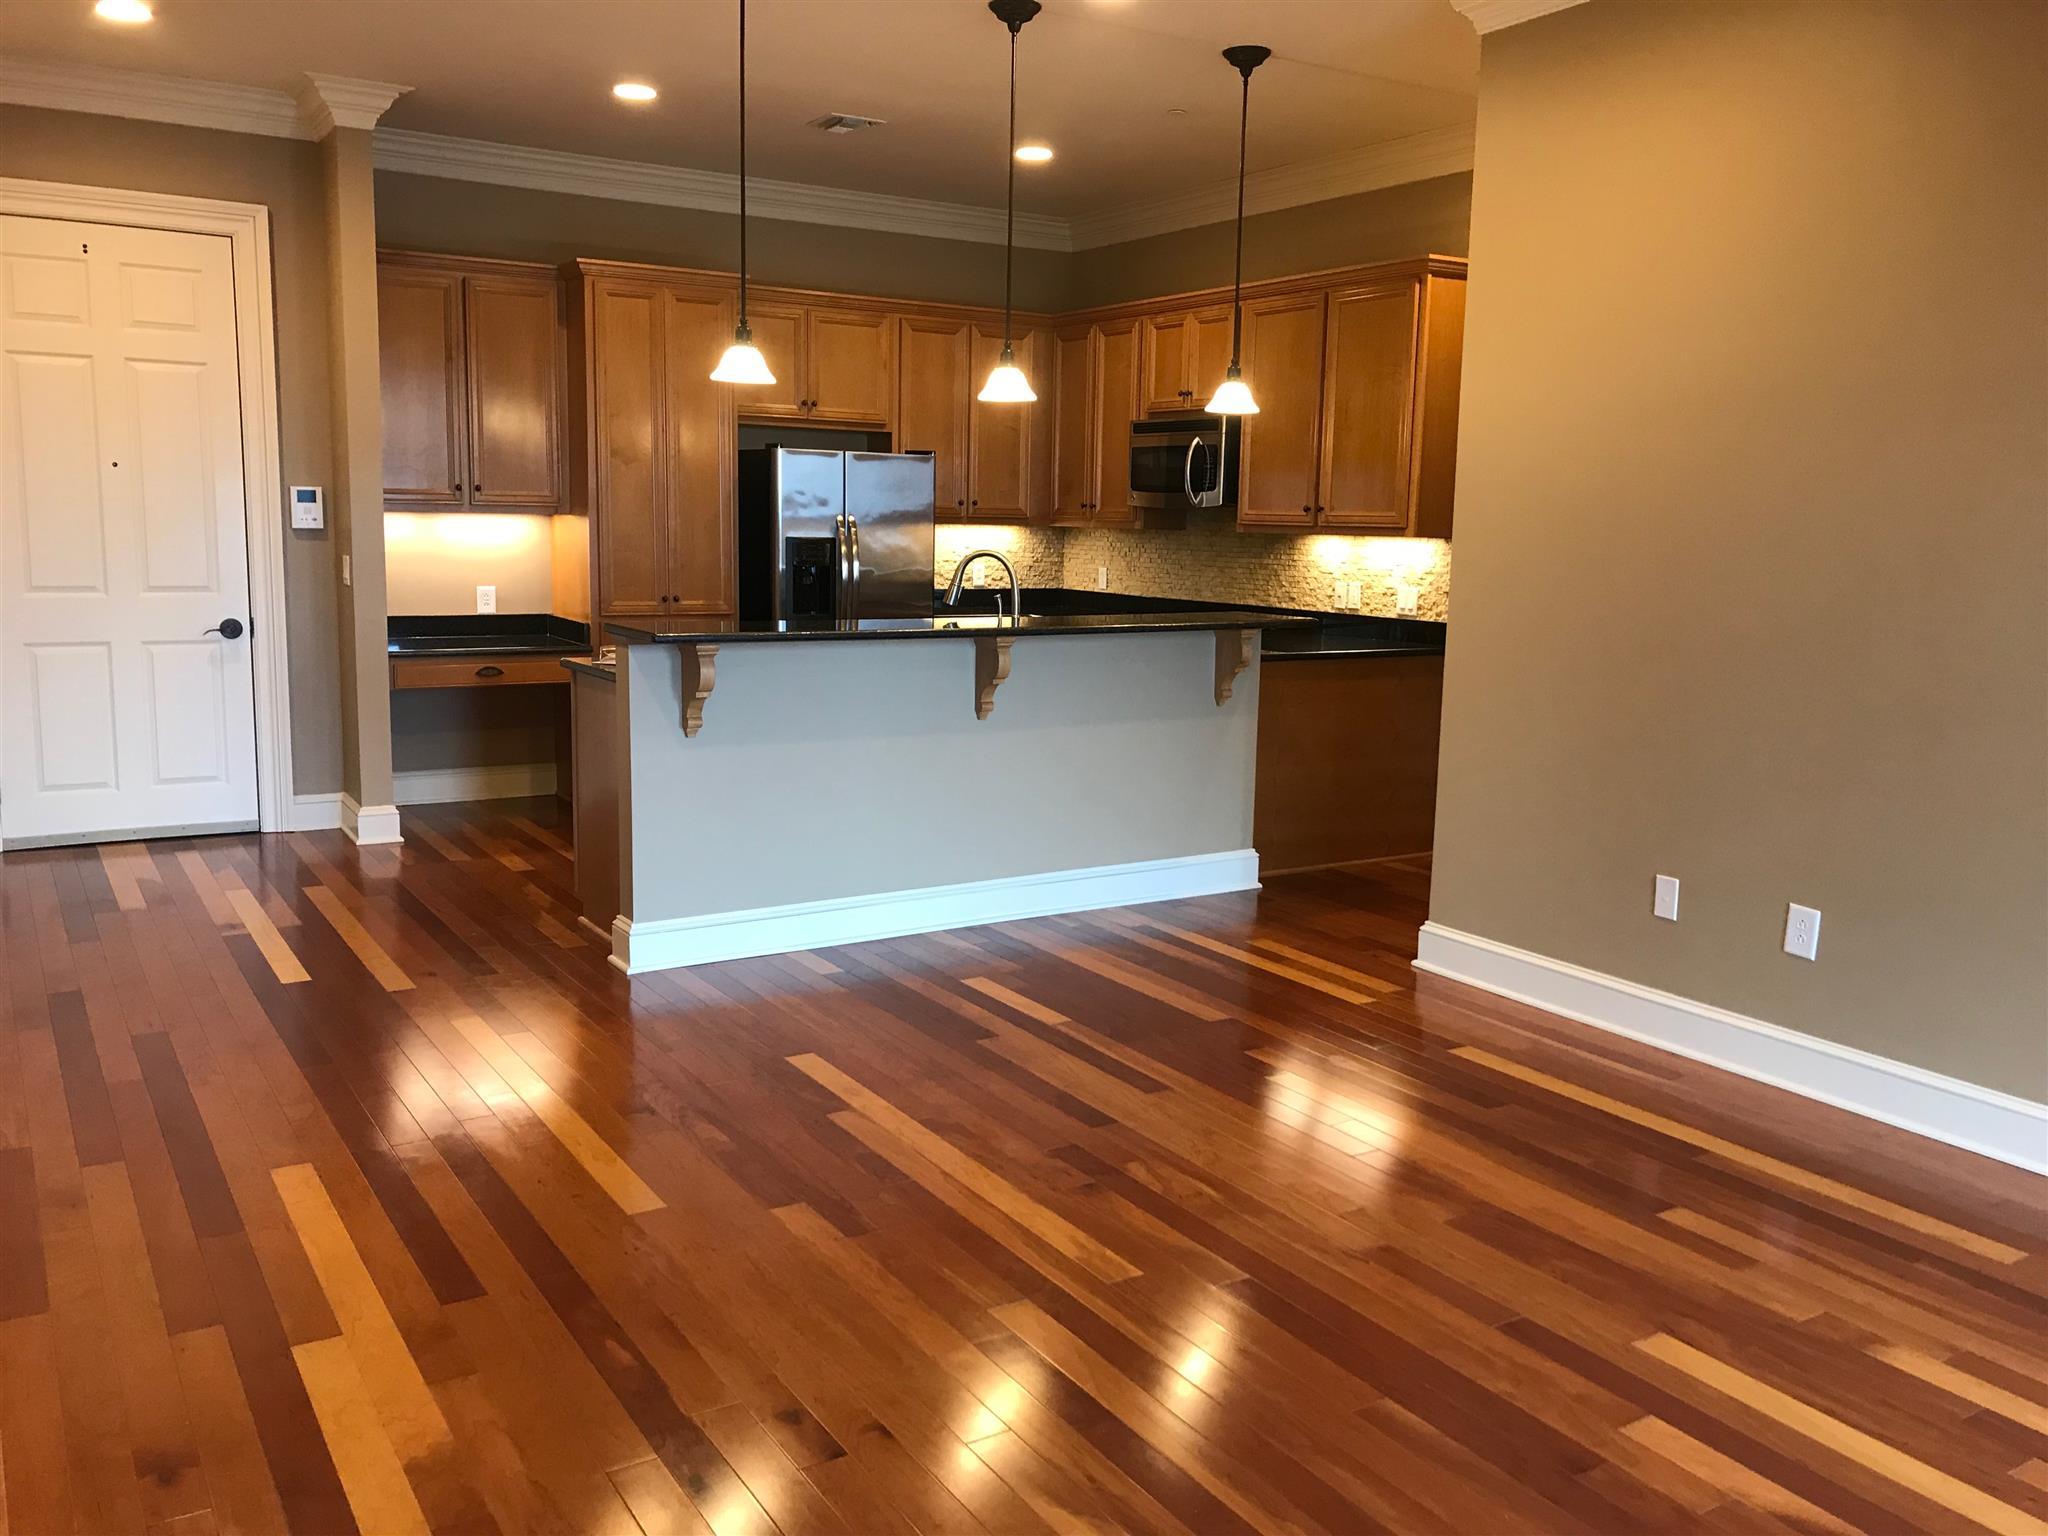 8204F N Thompson Ln, Murfreesboro, TN 37129 - Murfreesboro, TN real estate listing